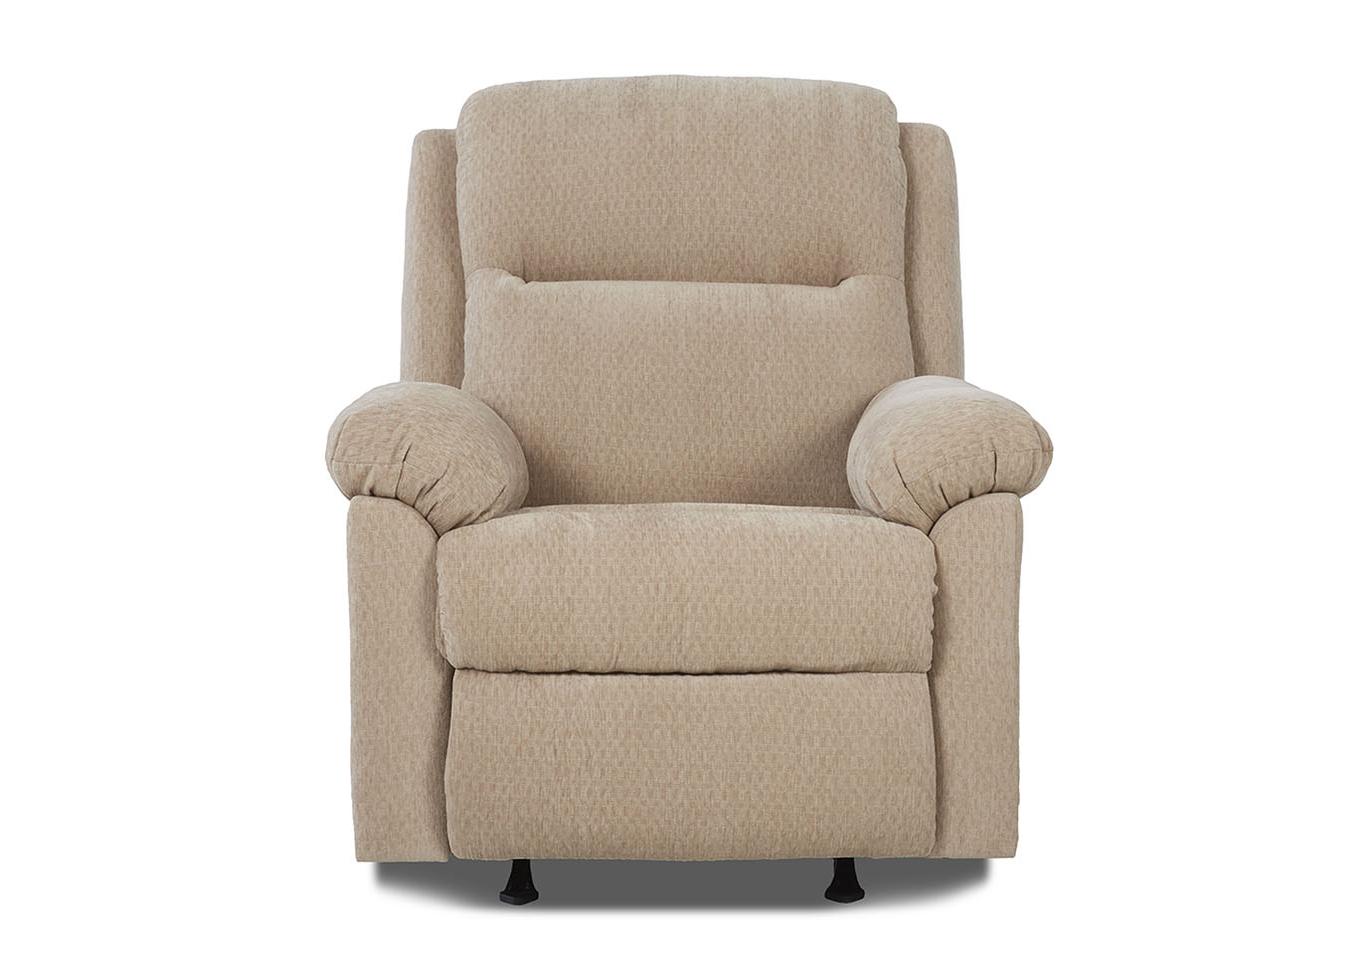 Amari Swivel Accent Chairs Inside Trendy Squan Furniture Amari Doe Beige Power Reclining Fabric Chair (Gallery 14 of 20)